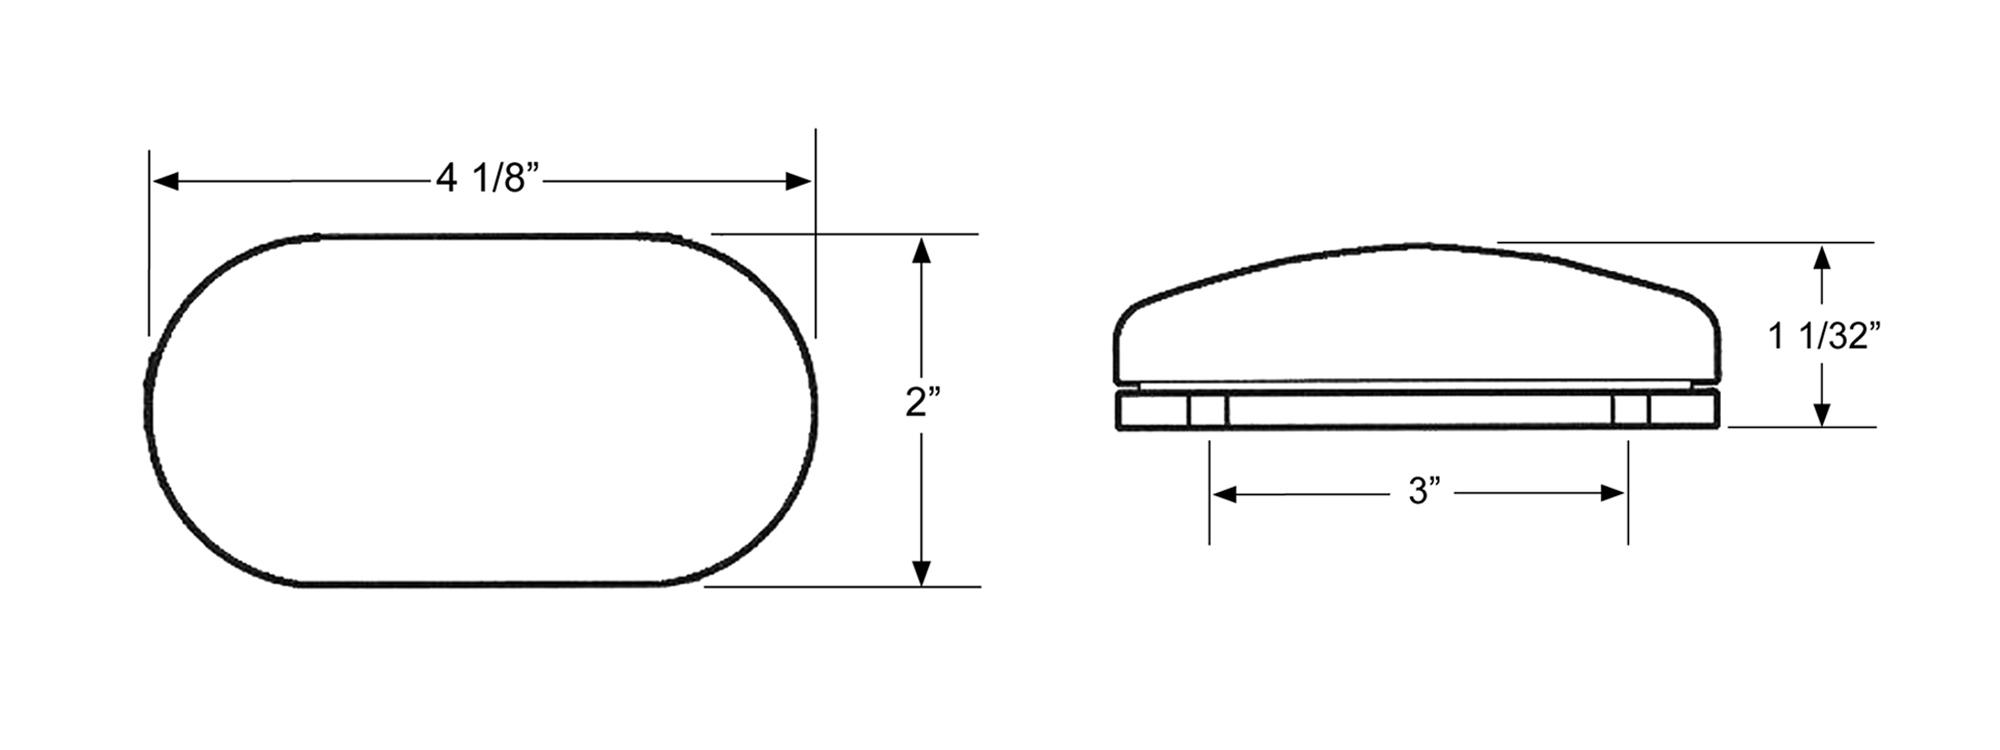 chevy truck wiring diagram also fog light relay wiring diagram